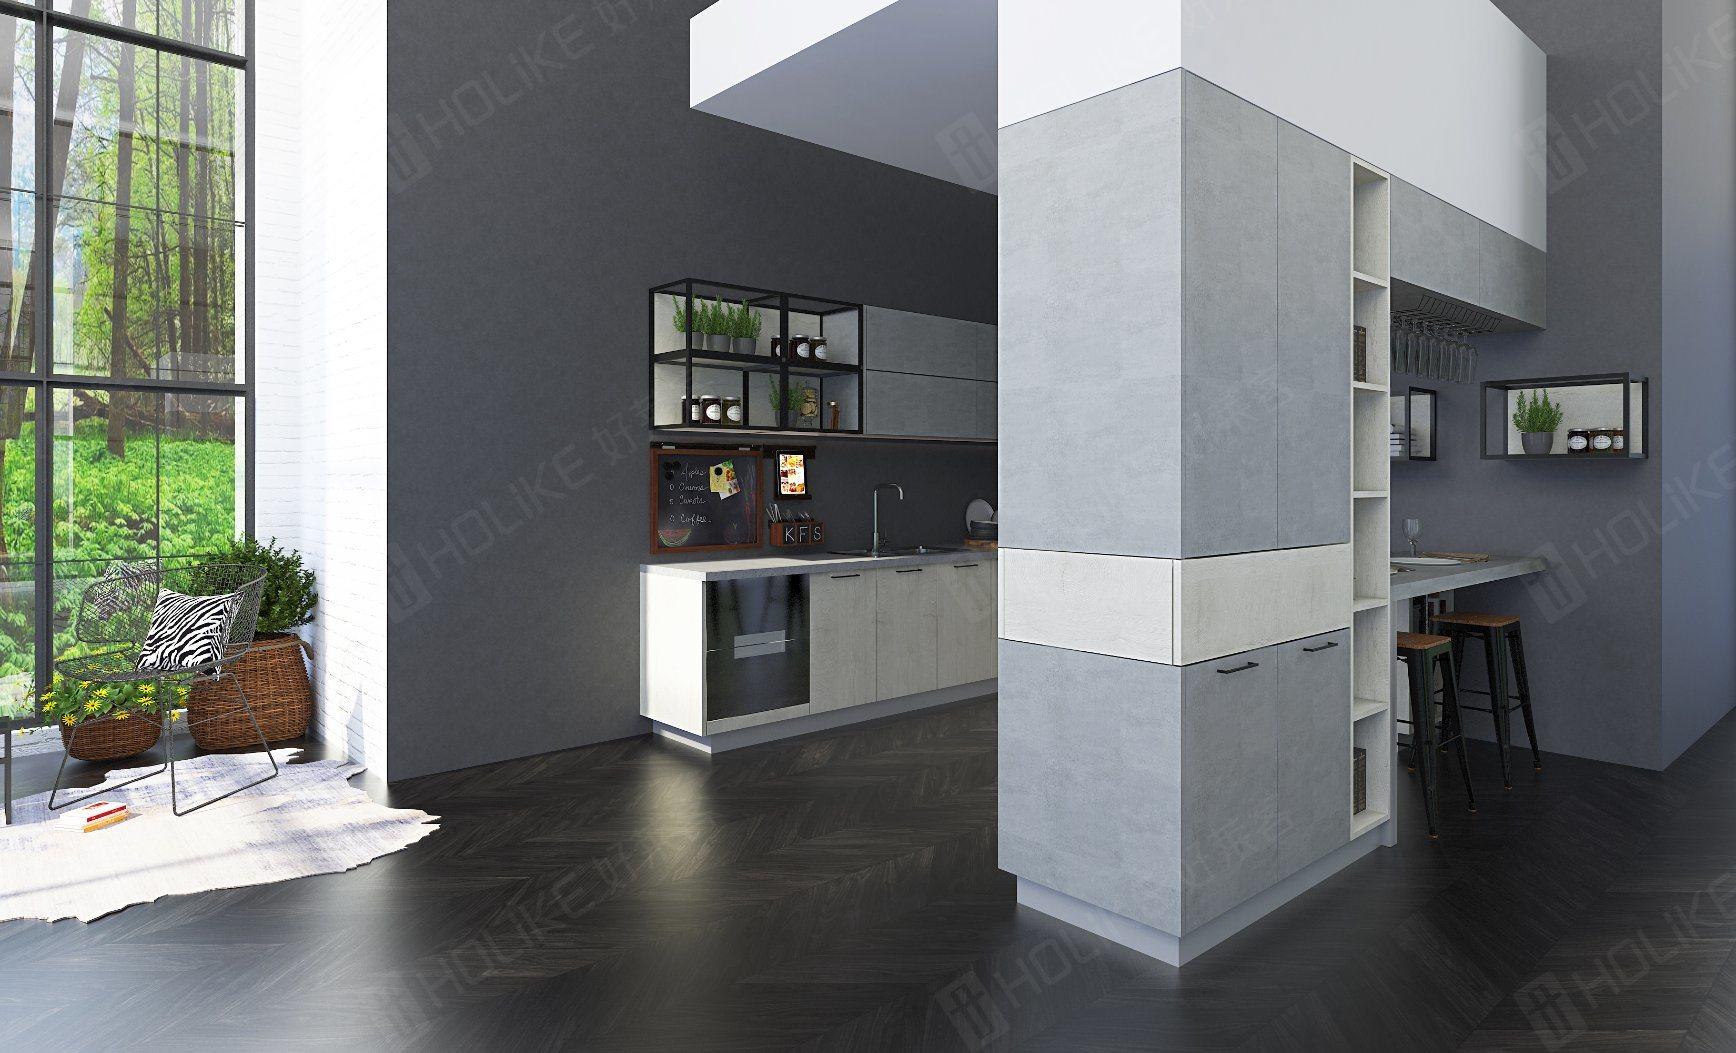 China Custom Mdf Solid Wood Kitchen Furniture Cabinets Online China Kitchen Cabinet Furniture